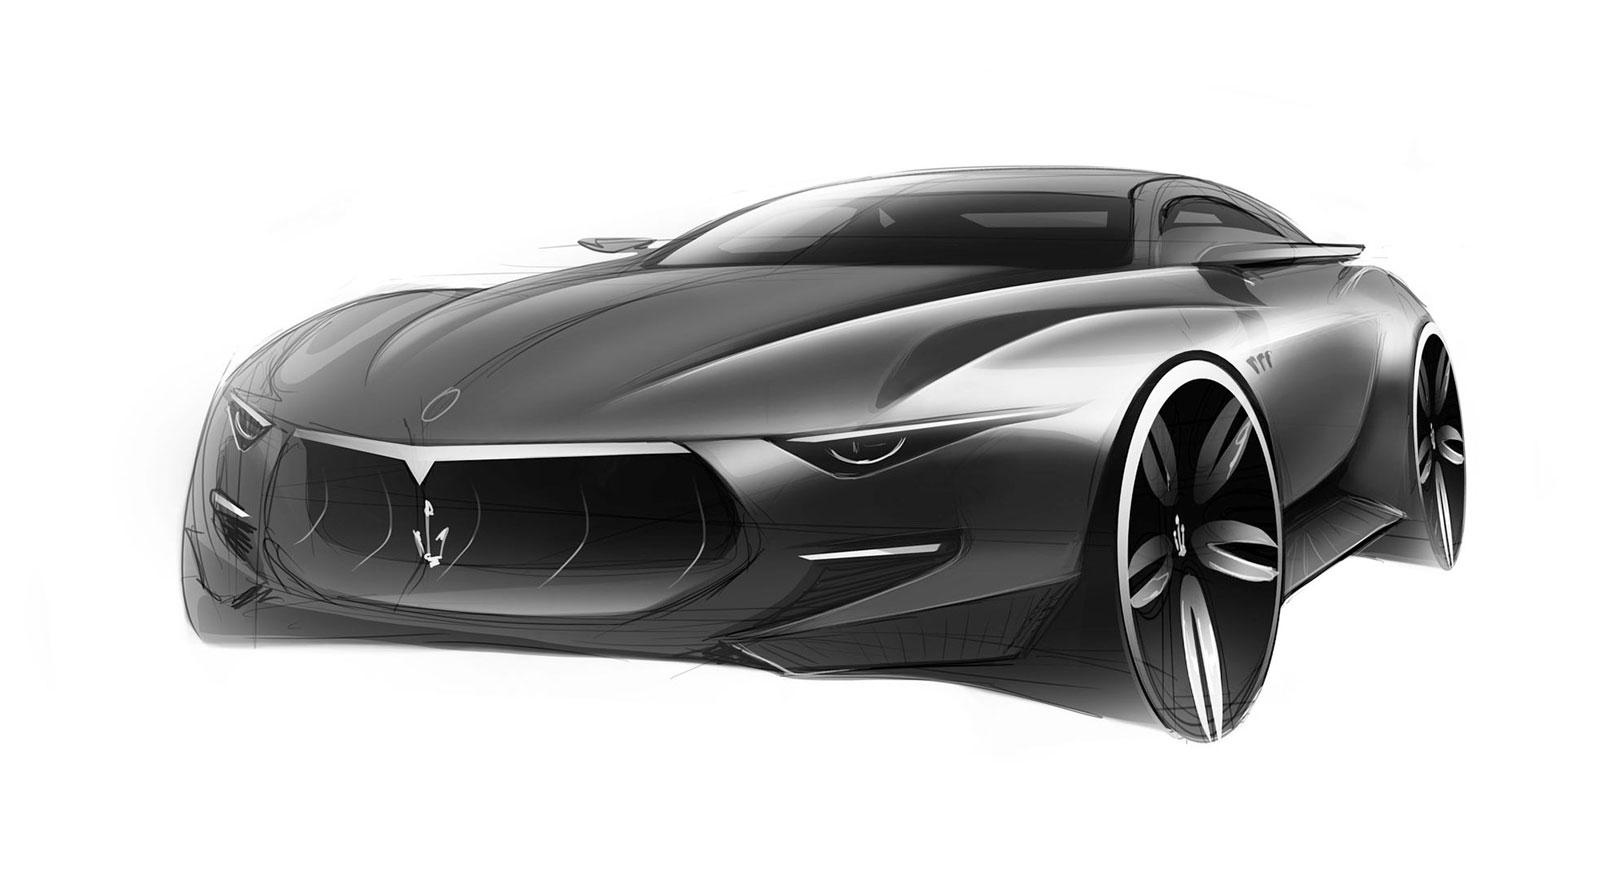 http://www.carbodydesign.com/media/2014/03/Maserati-Alfieri-Concept-Design-Sketch-02.jpg